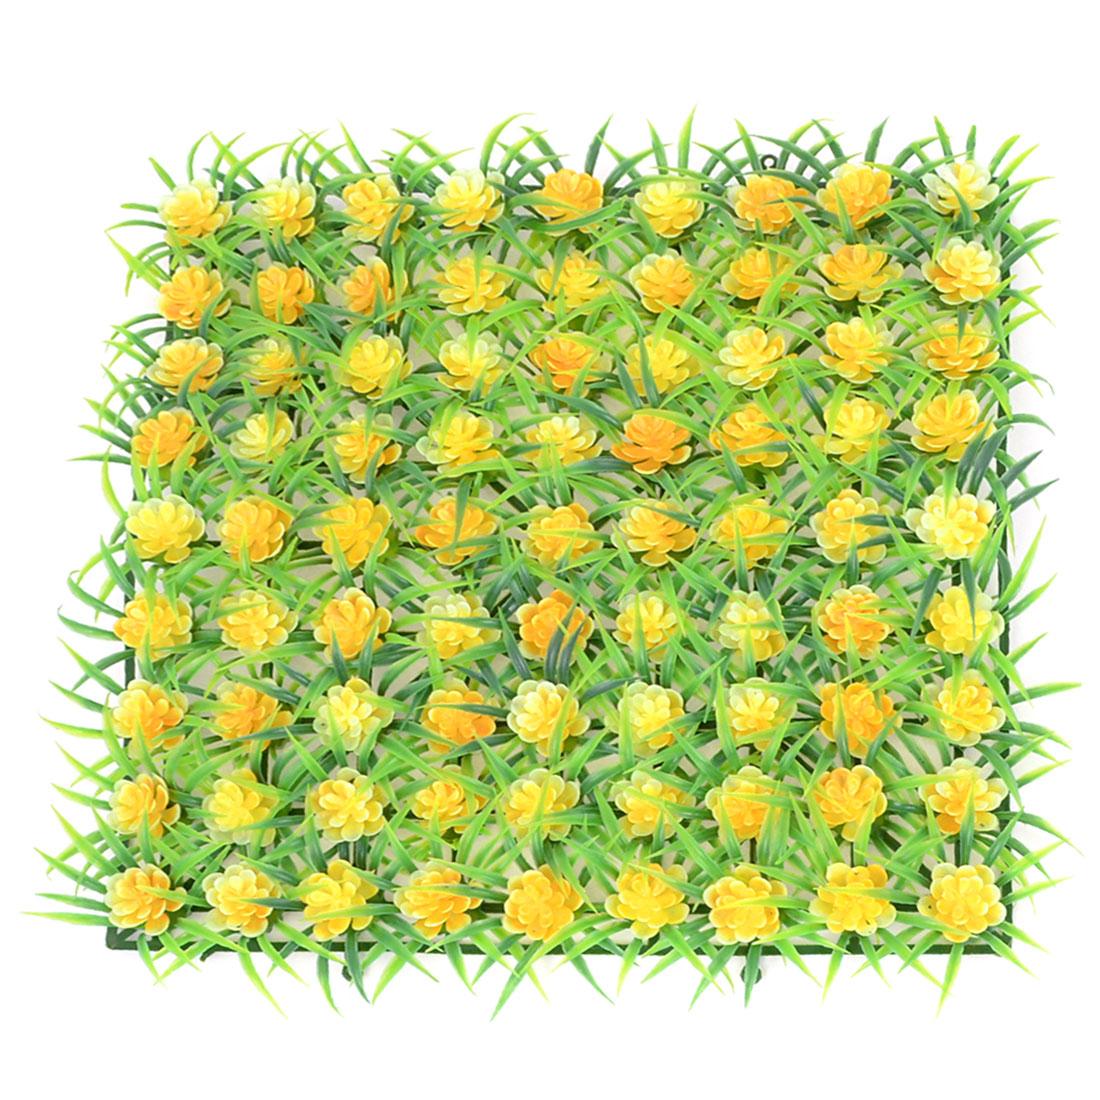 Yellow Green Plastic Emulation Underwater Plant Grass Flower 22x22cm for Fish Tank